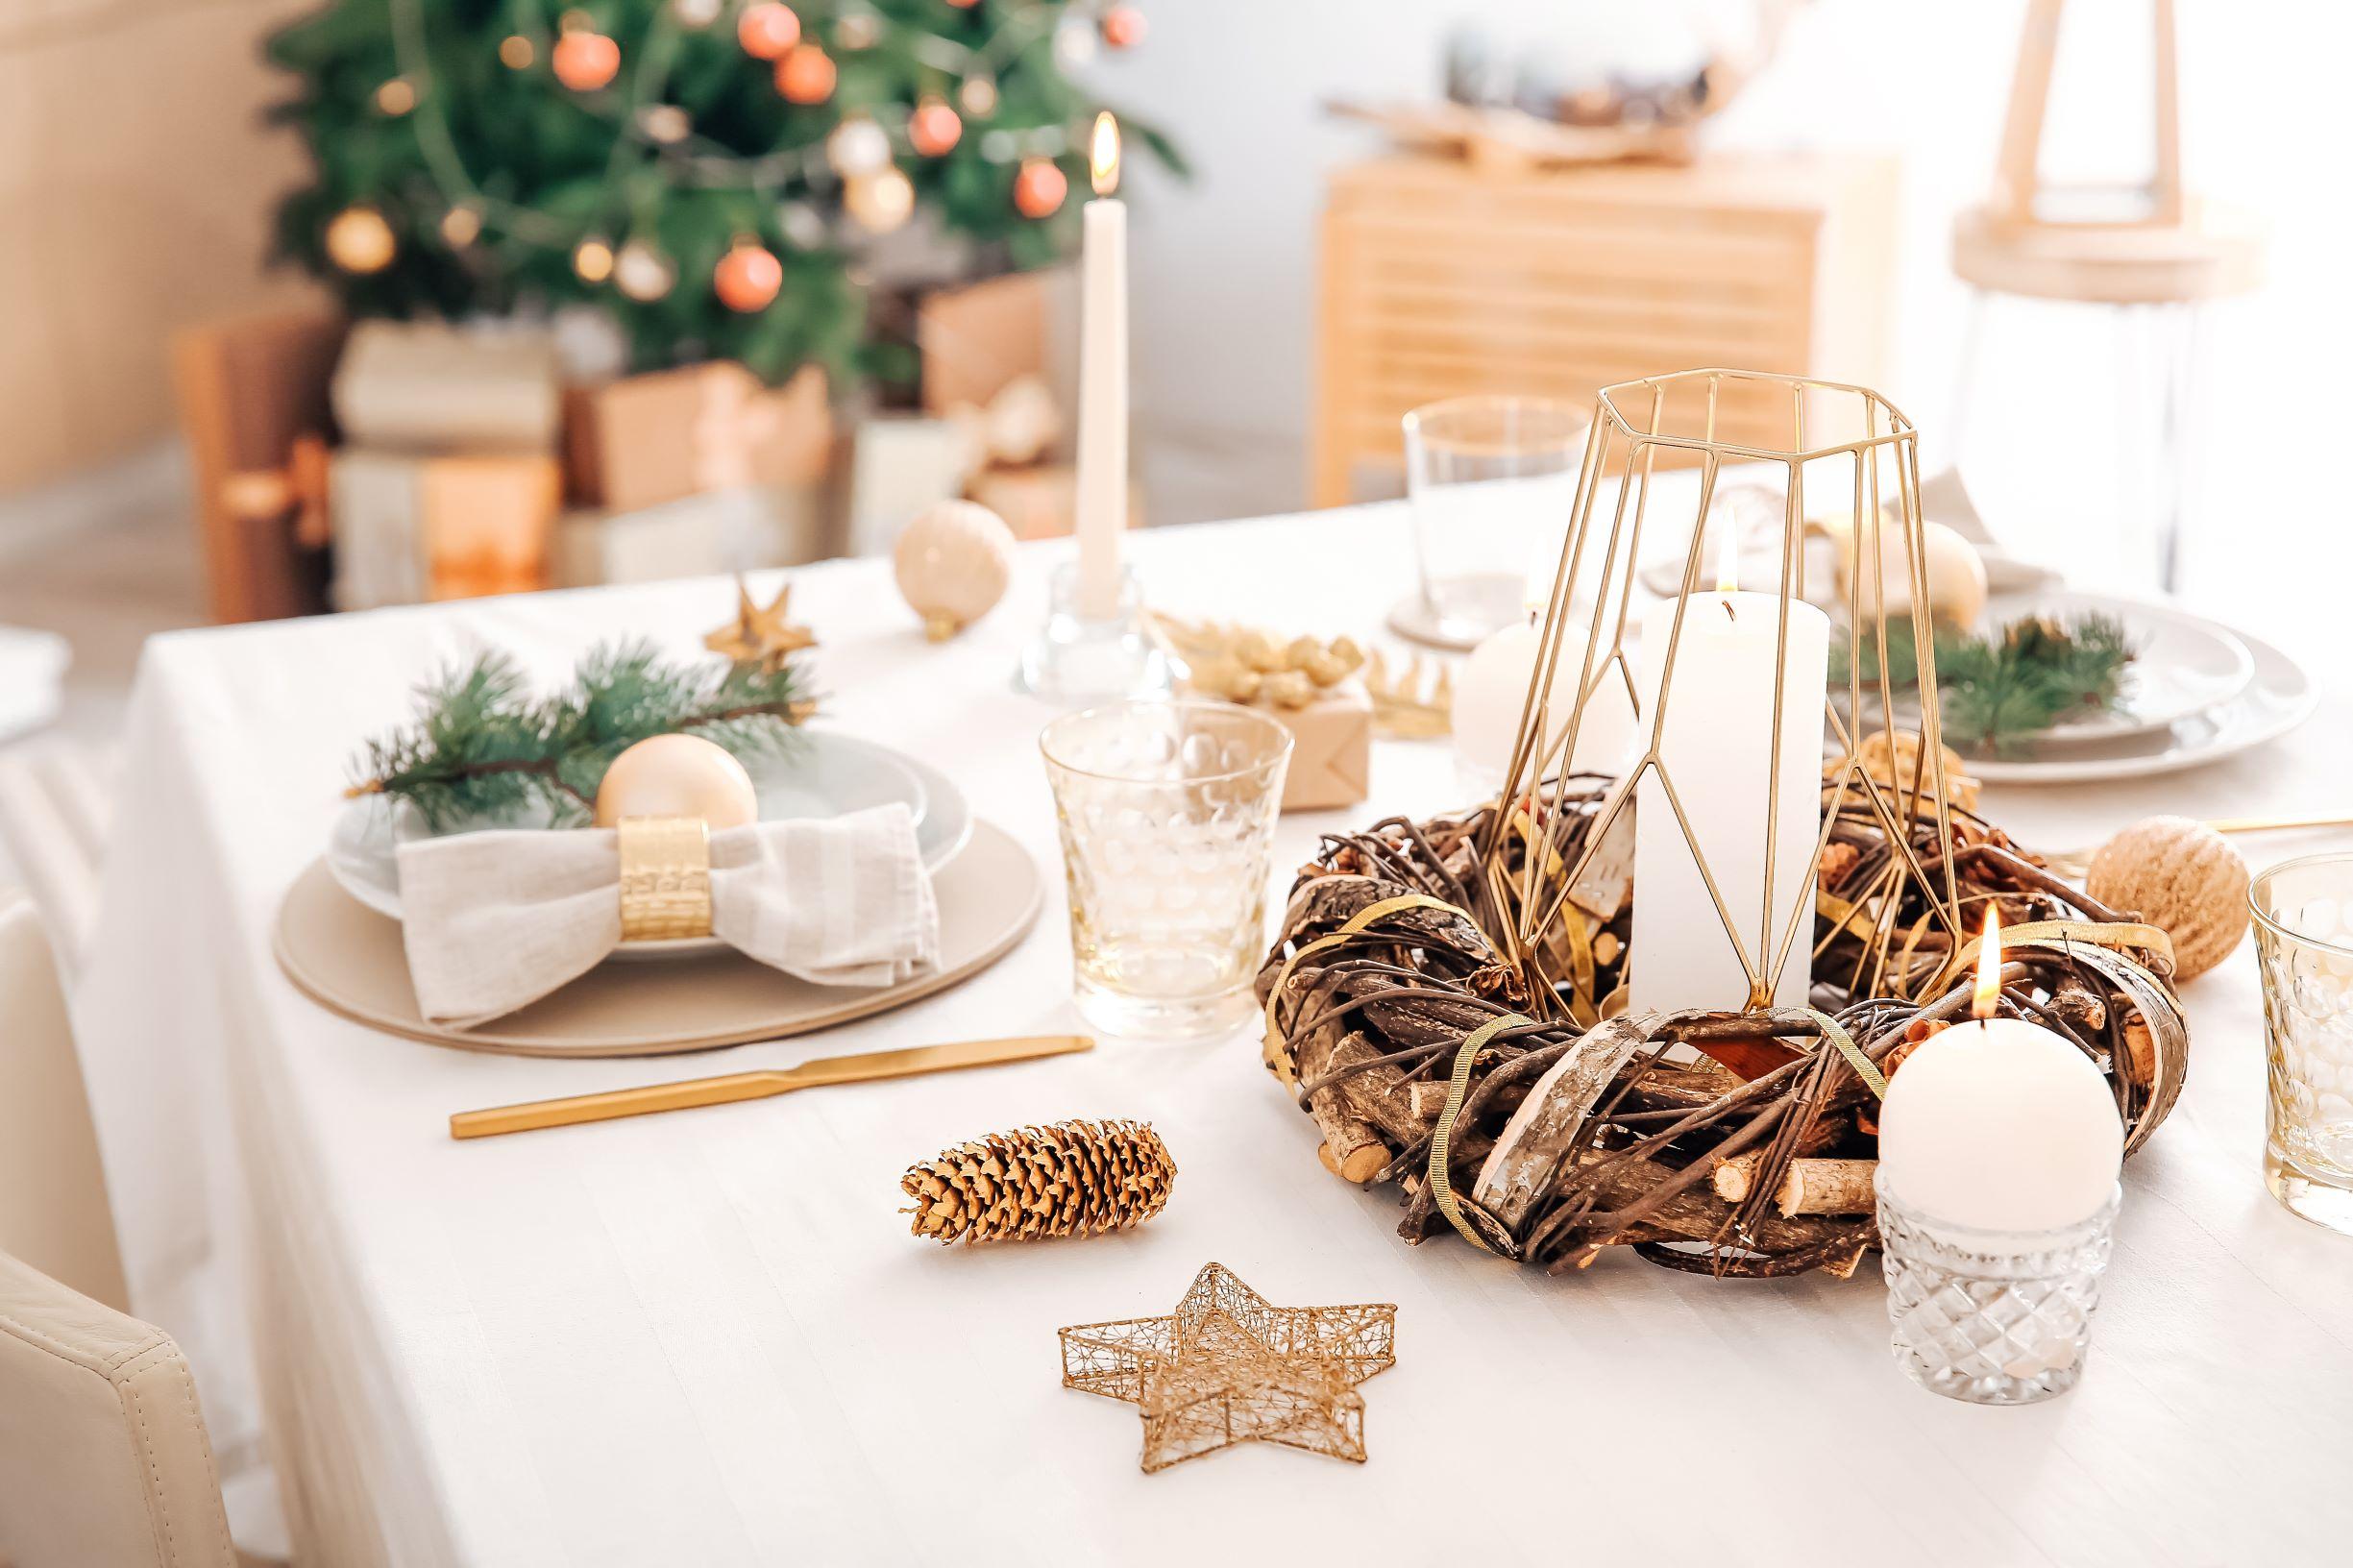 Christmas Napkin Bow Fold with Gold Napkin Ring